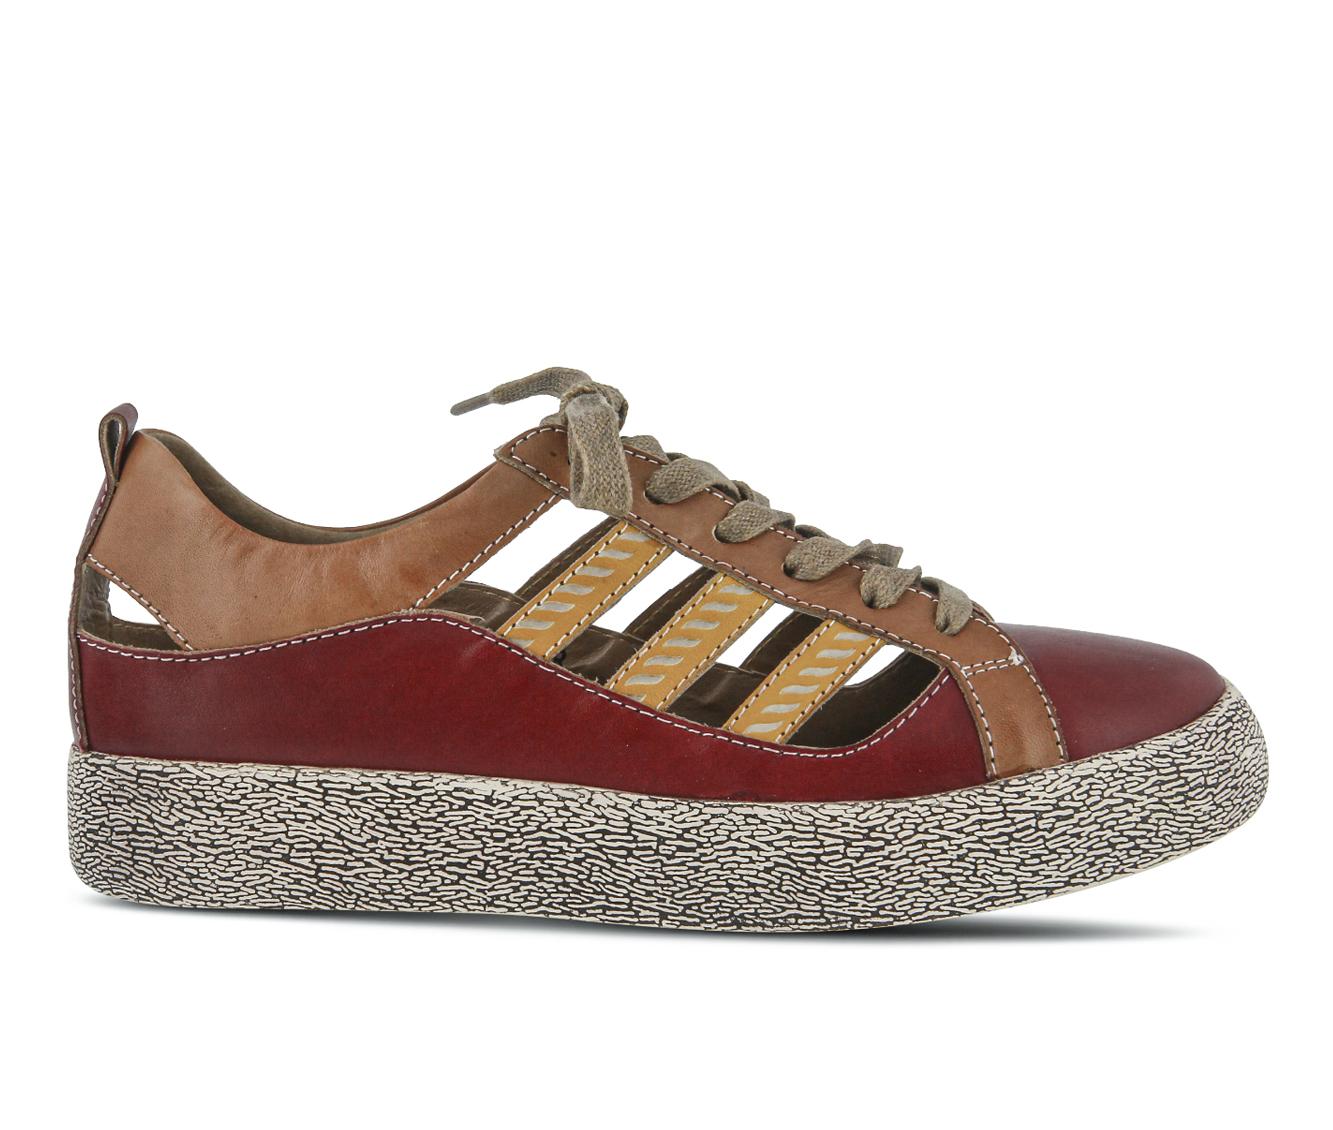 L'Artiste Porscha Women's Shoe (Red Leather)